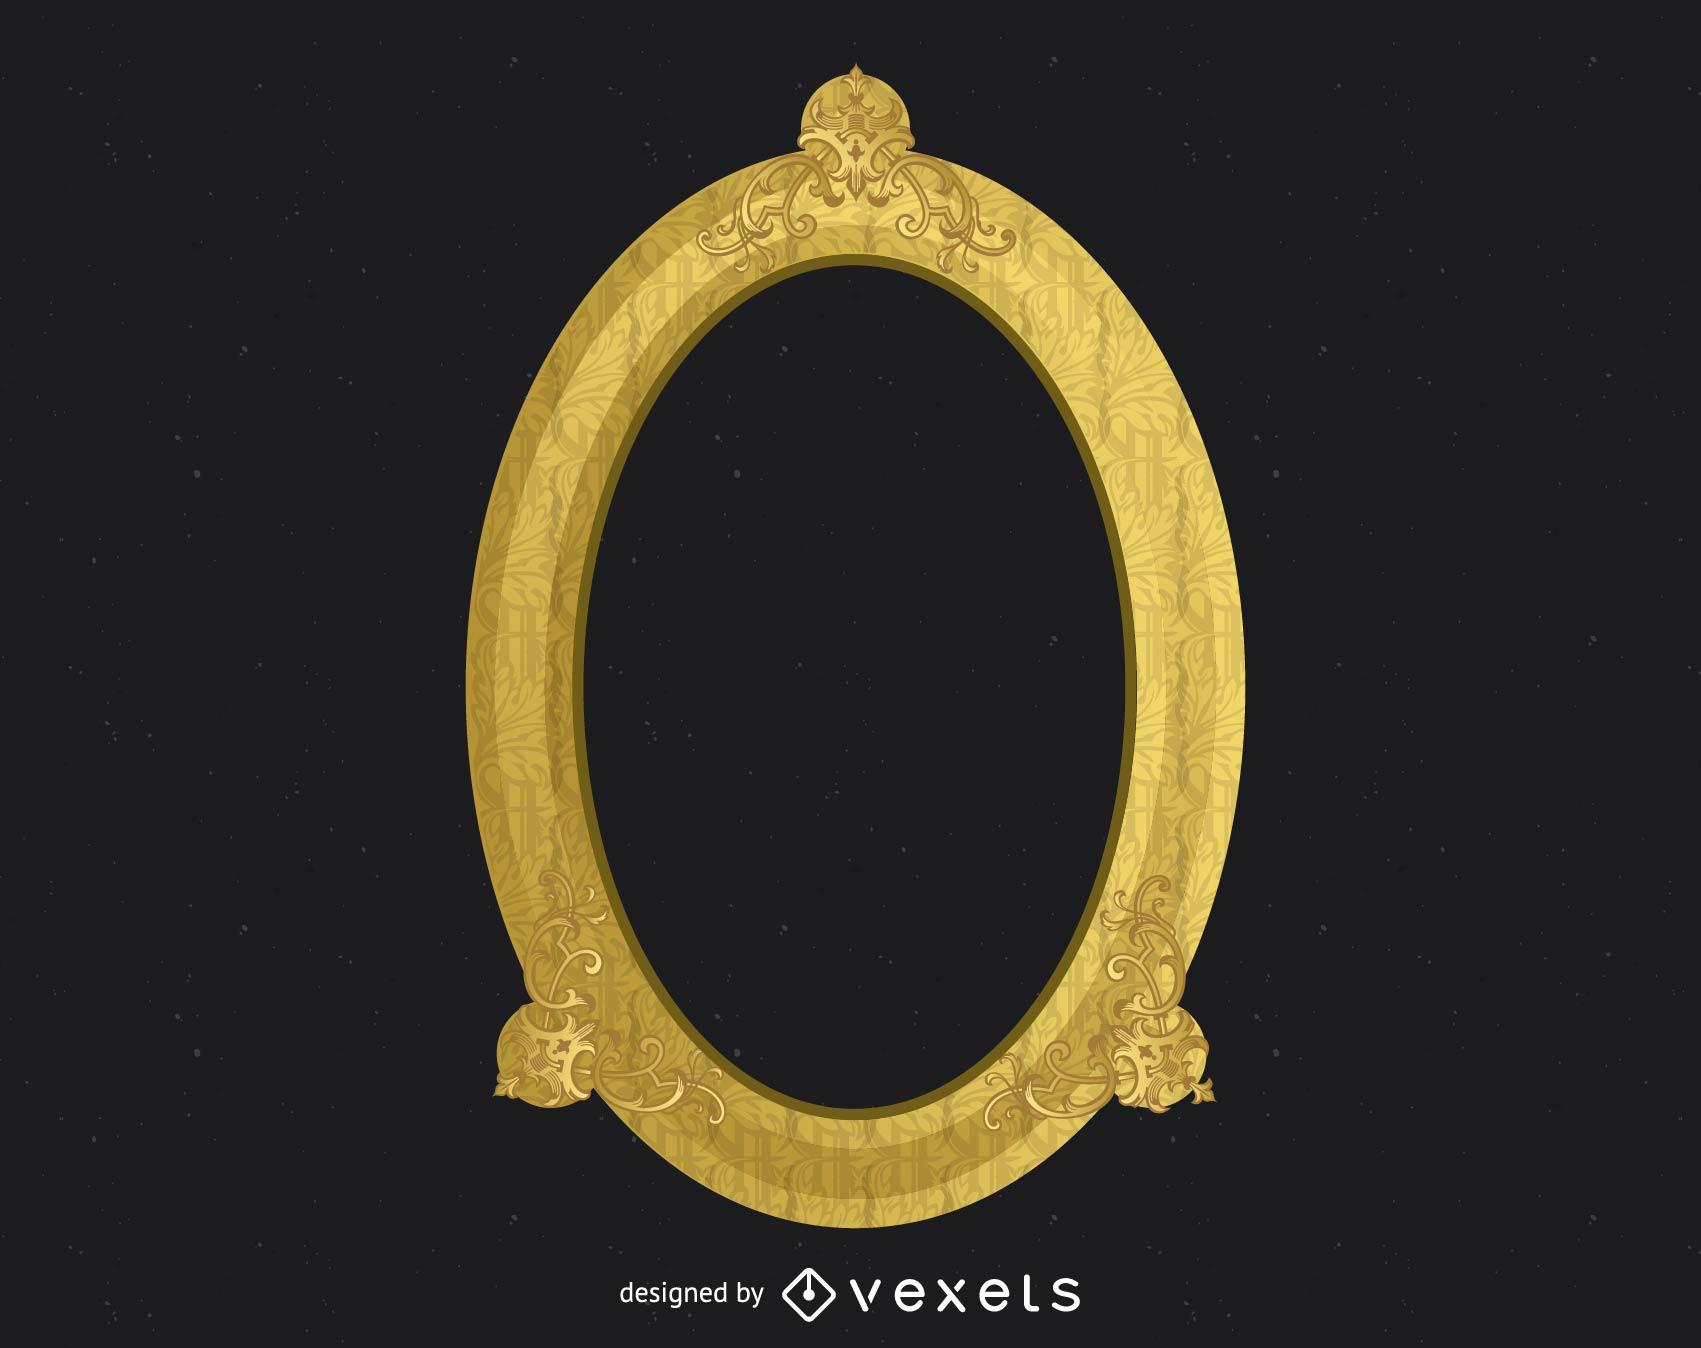 Marco dorado ornamentado antiguo